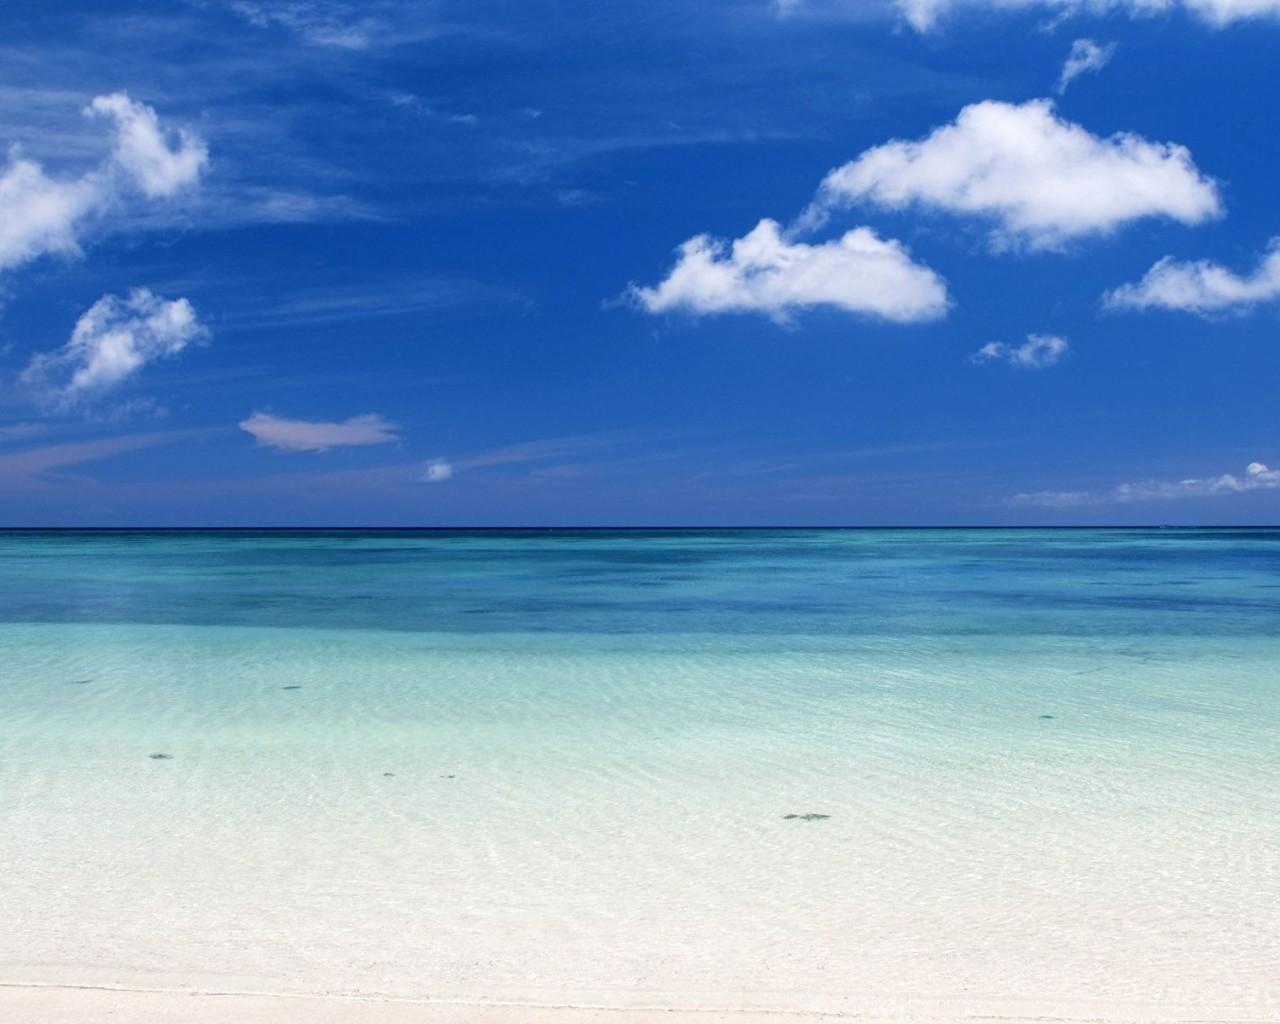 Beautiful Caribbean Beach High Resolution Windows 8 Wallpaper HD 1280x1024